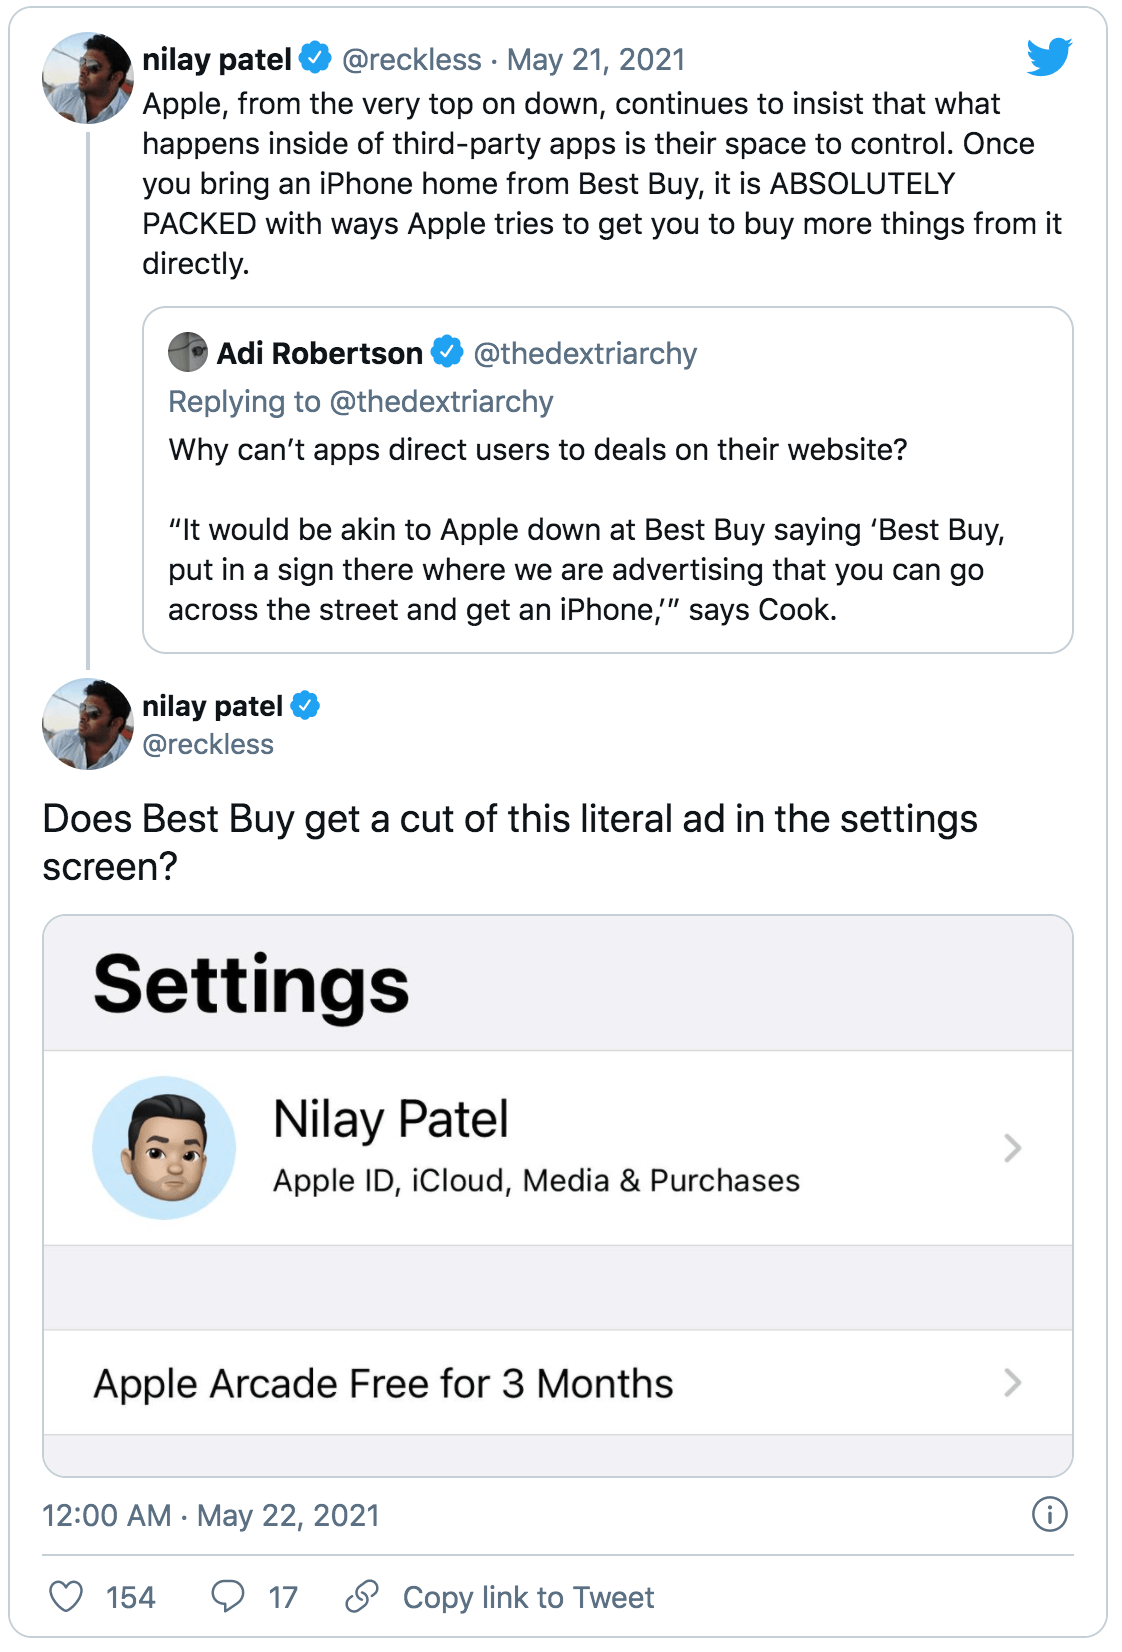 Nilay Patel refutes the Best Buy argument